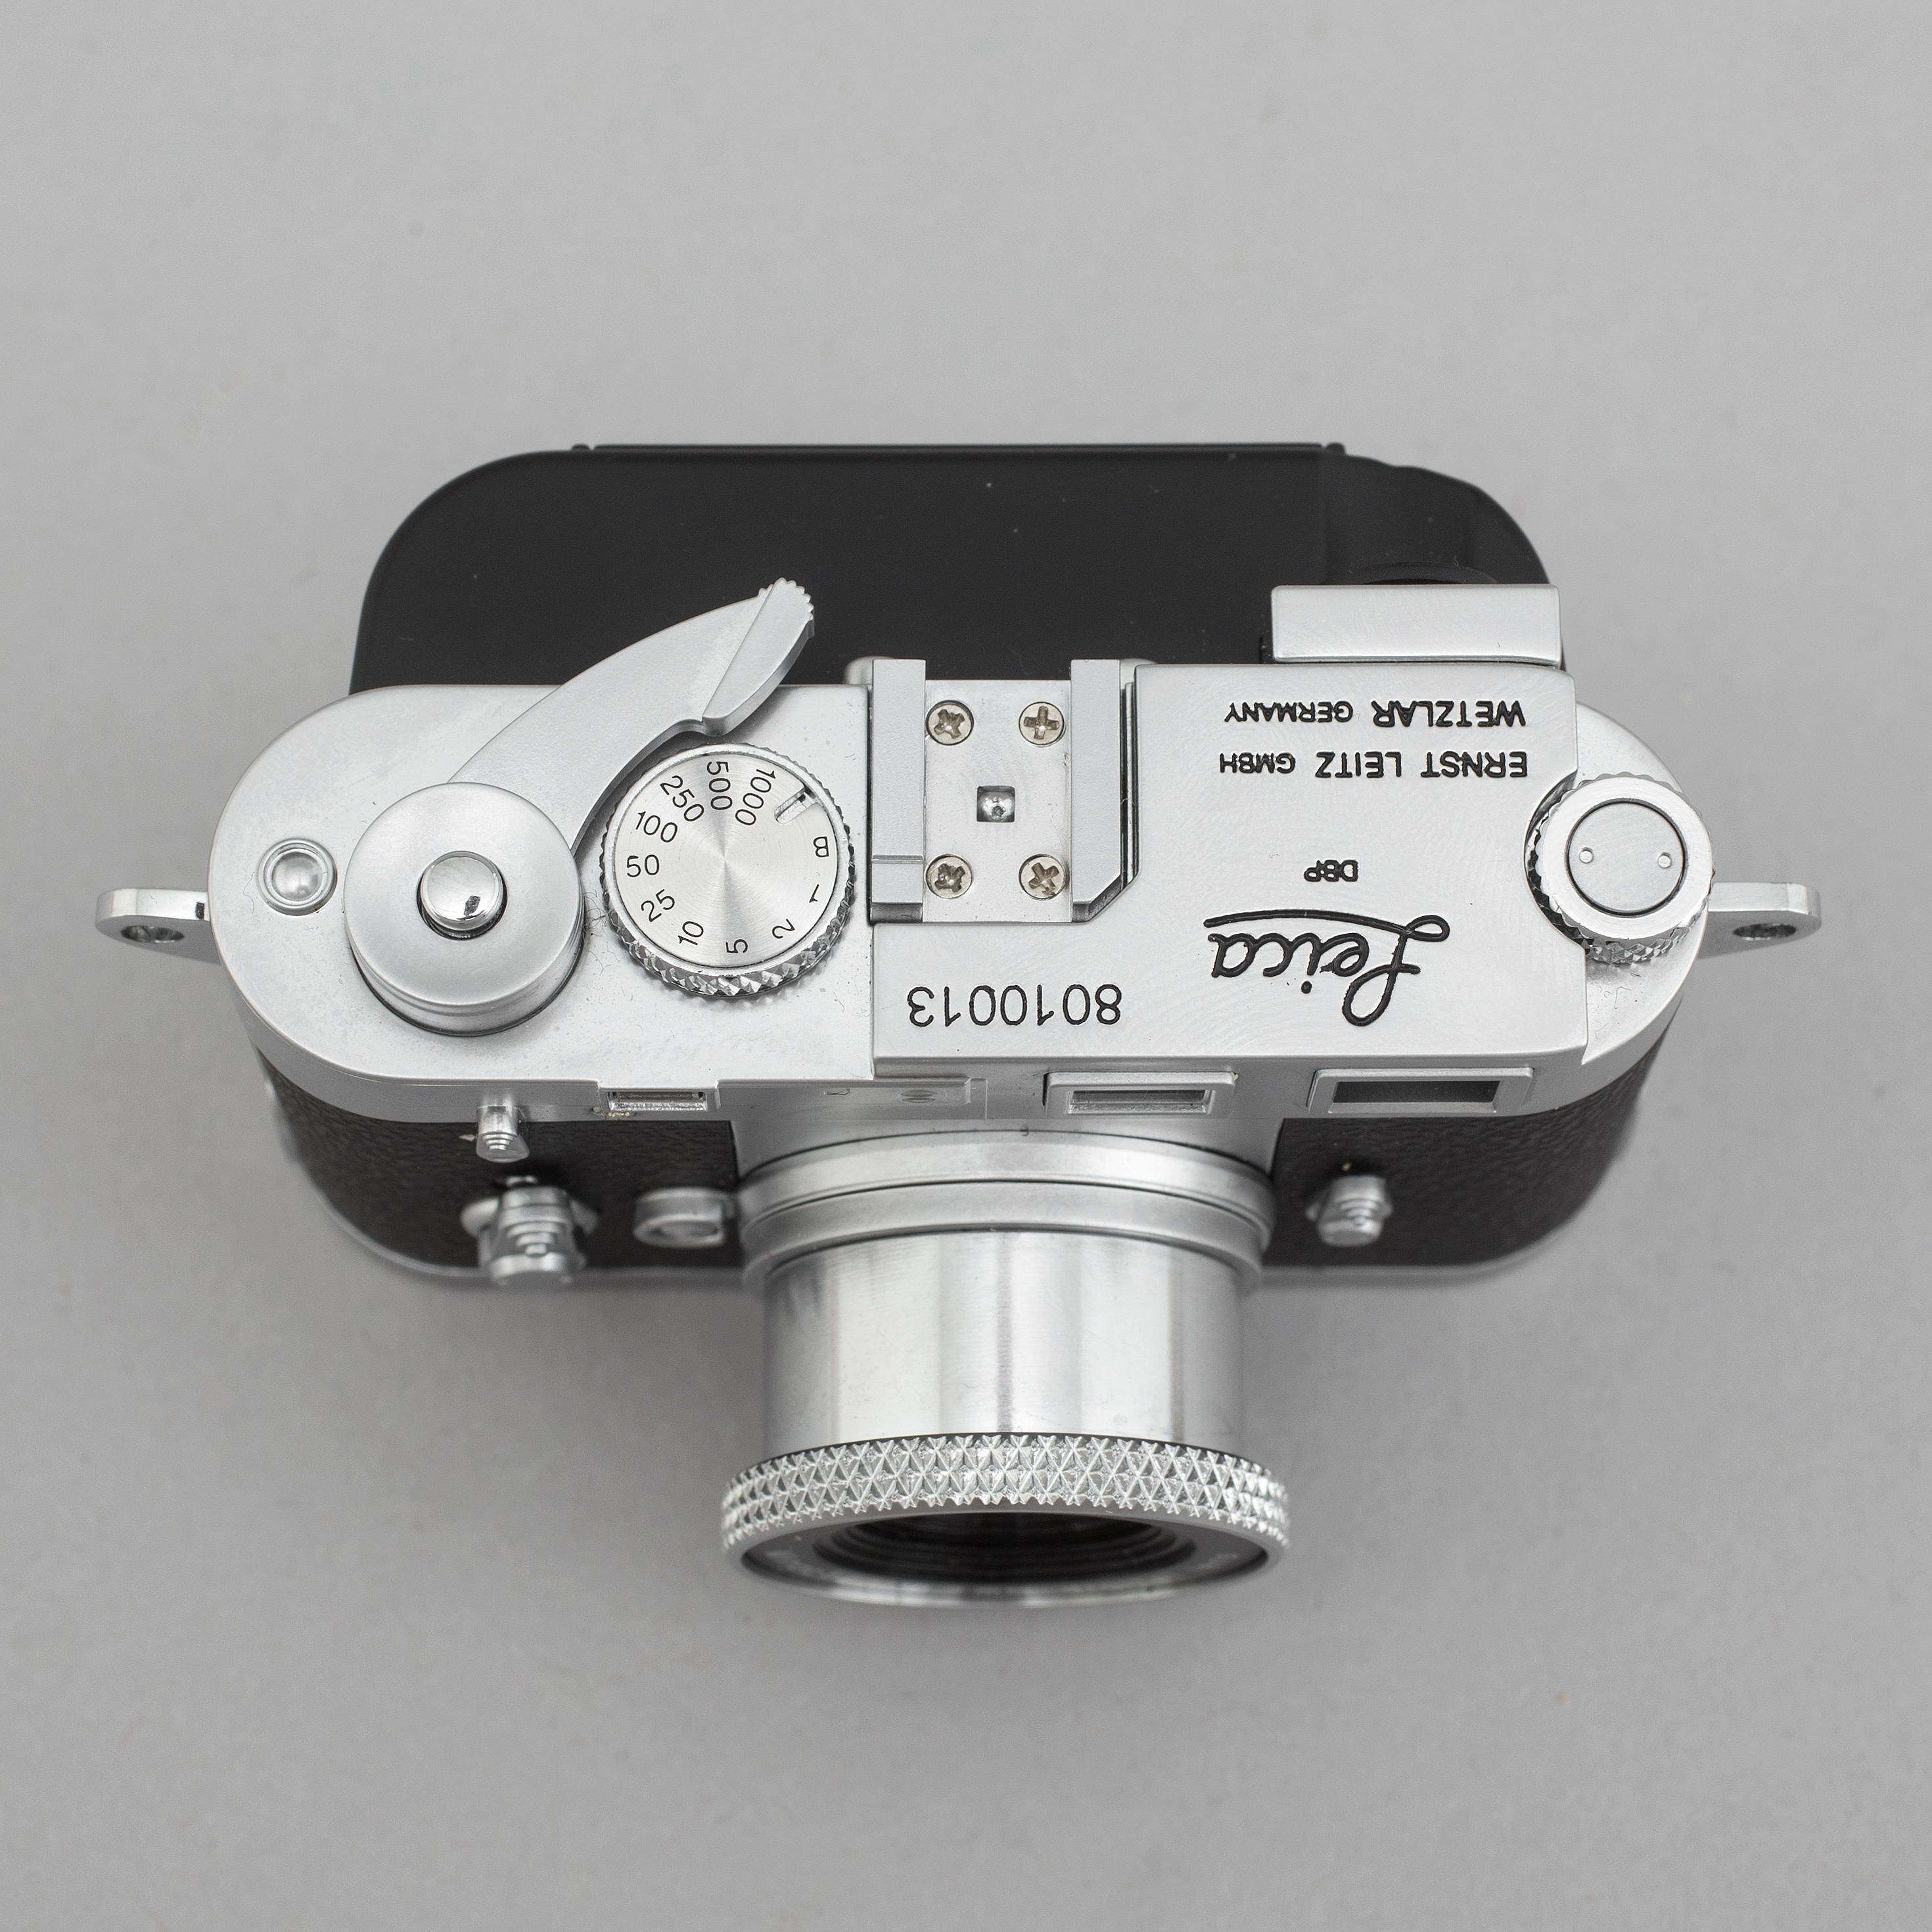 Dating Leica M3